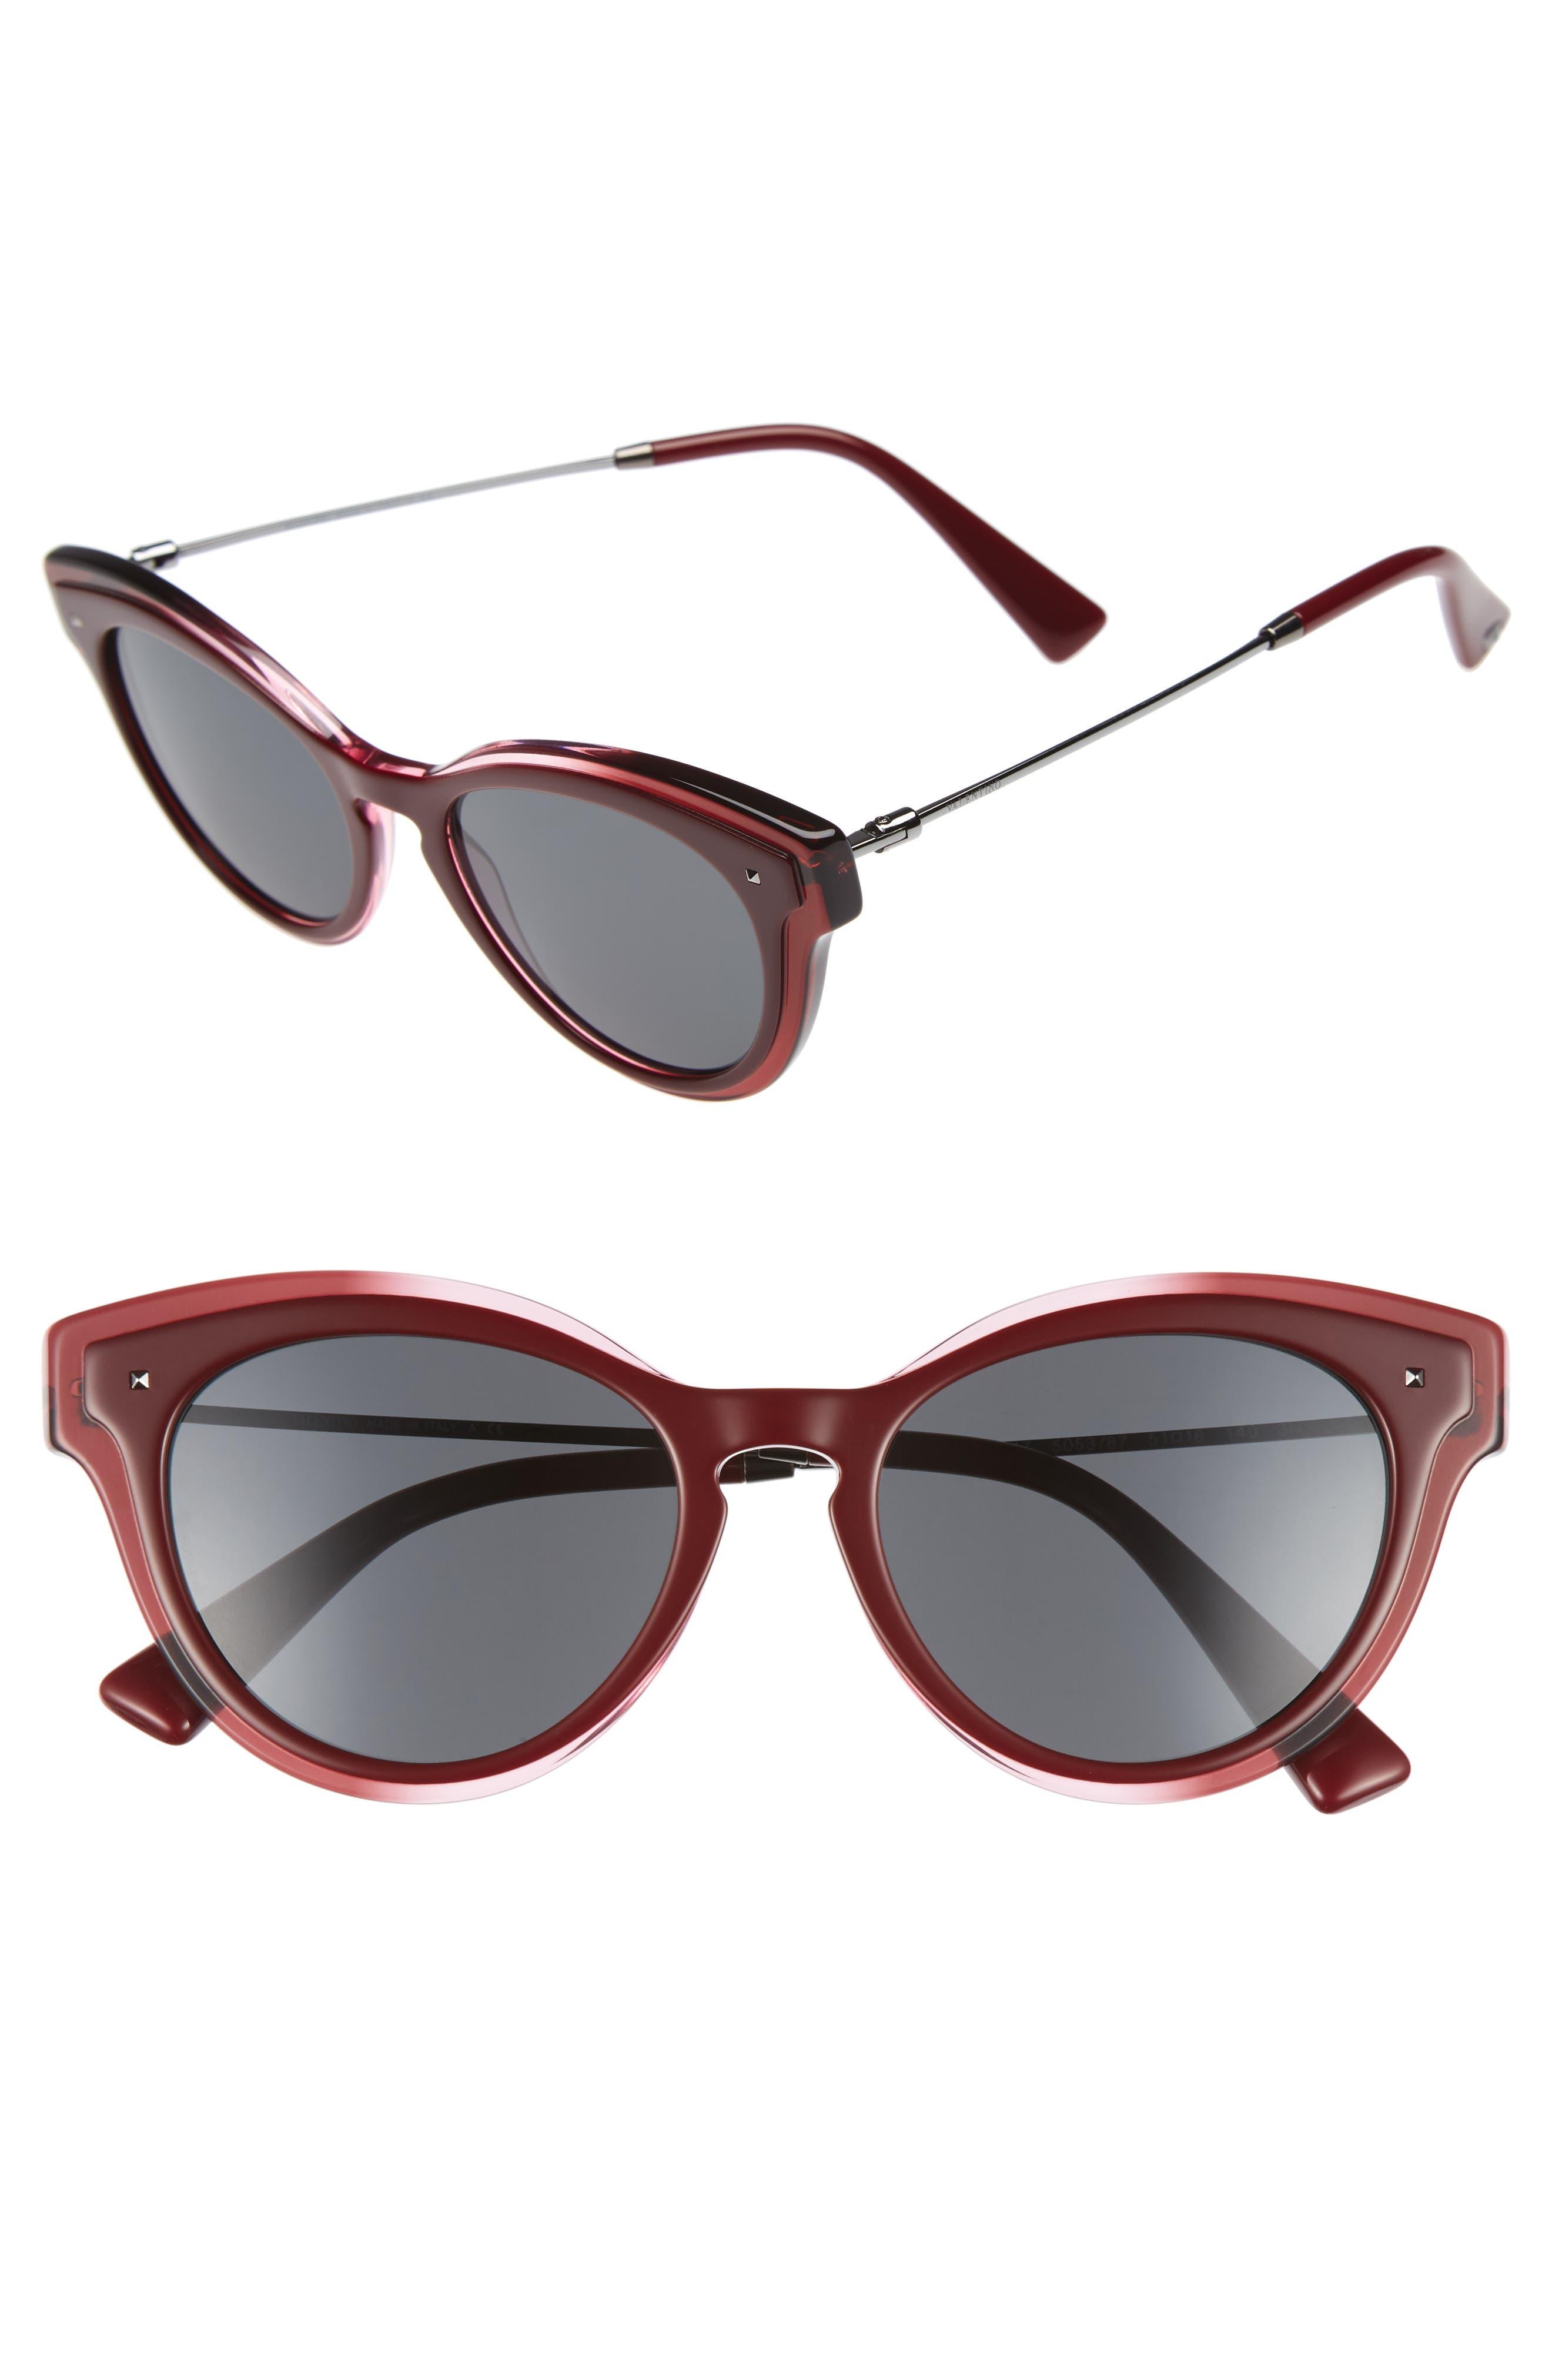 51mm Cat Eye Sunglasses,                         Main,                         color, 600